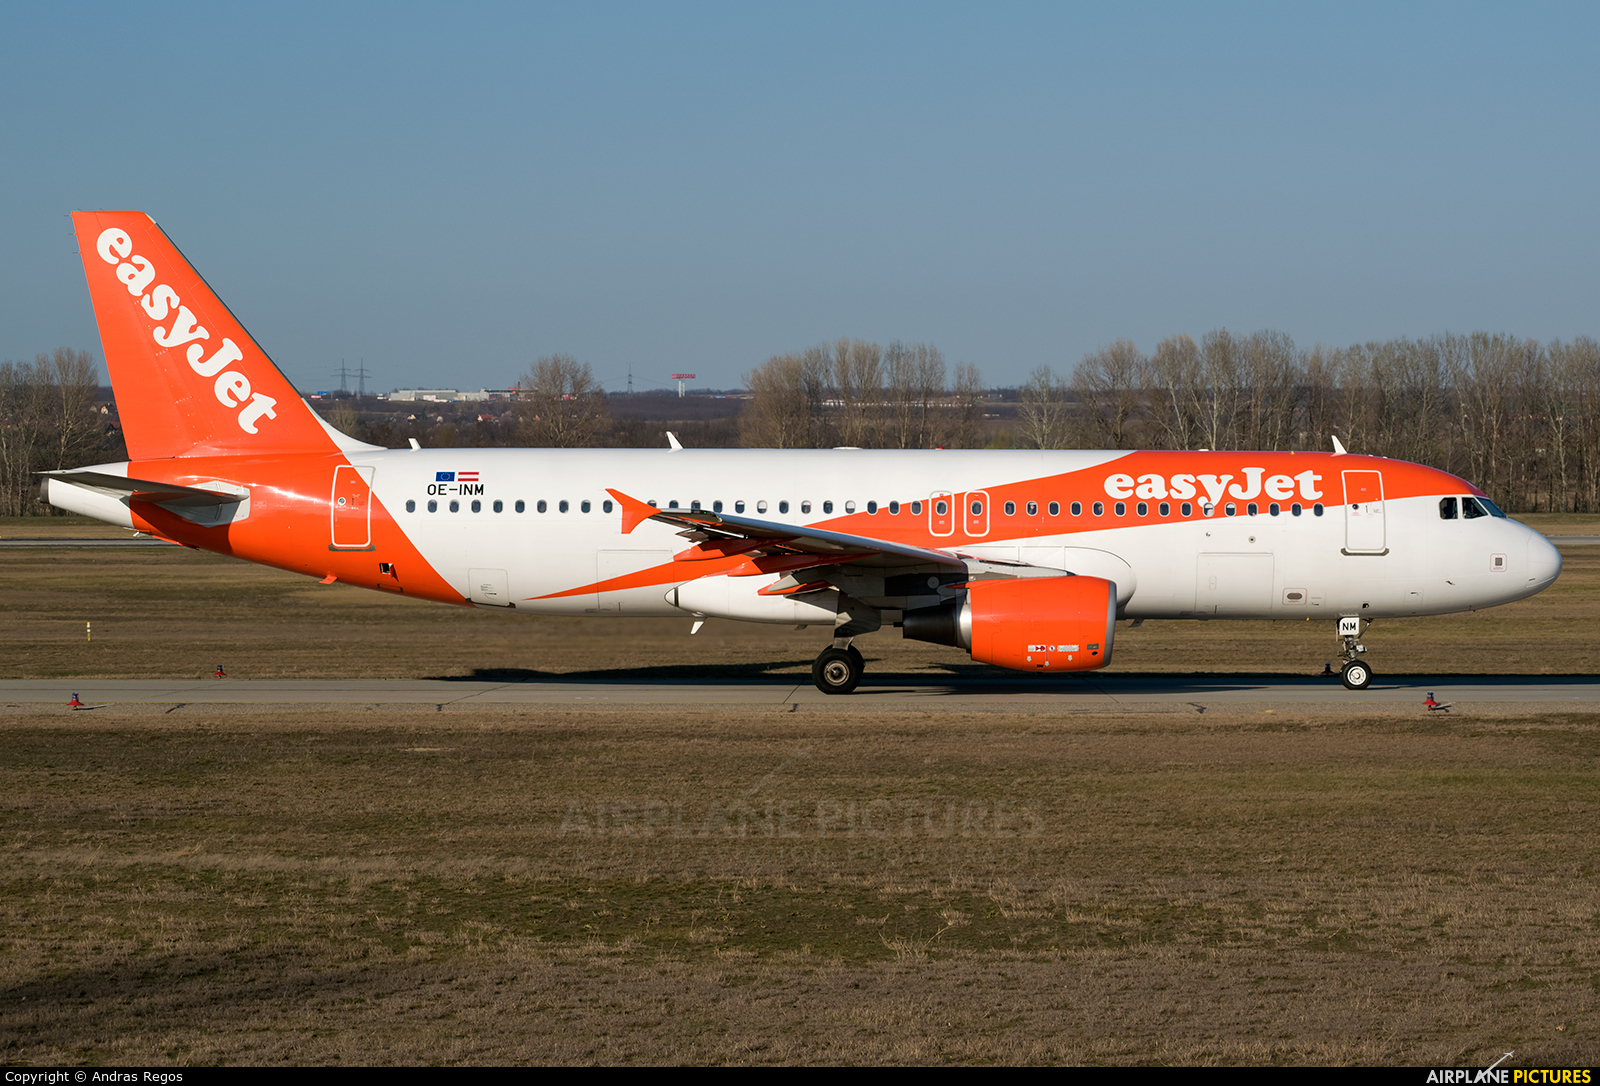 easyJet Europe OE-INM aircraft at Budapest Ferenc Liszt International Airport